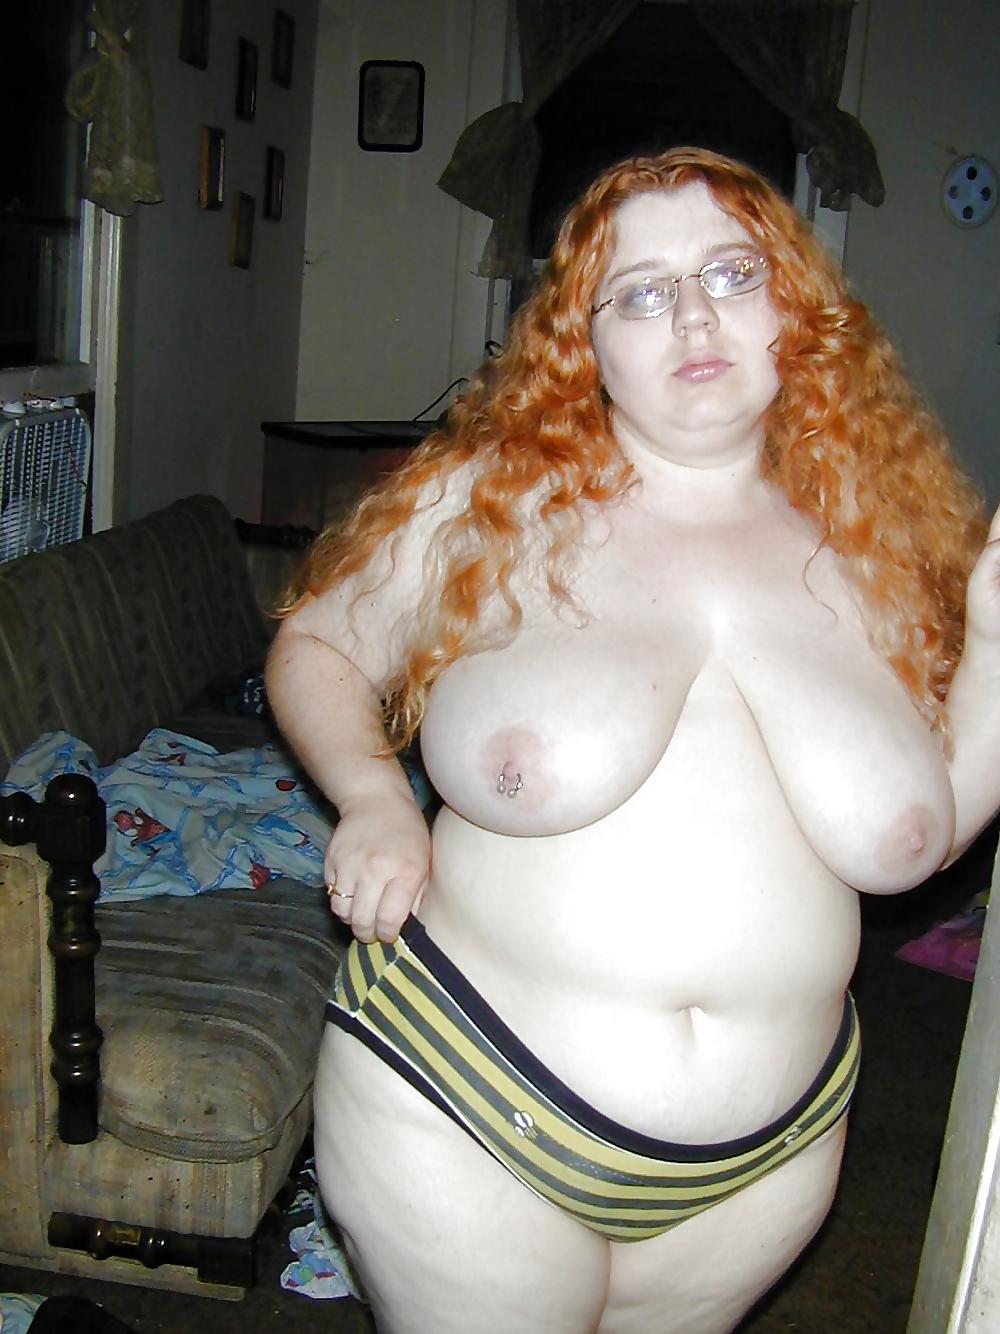 bbw-redhead-sexy-nude